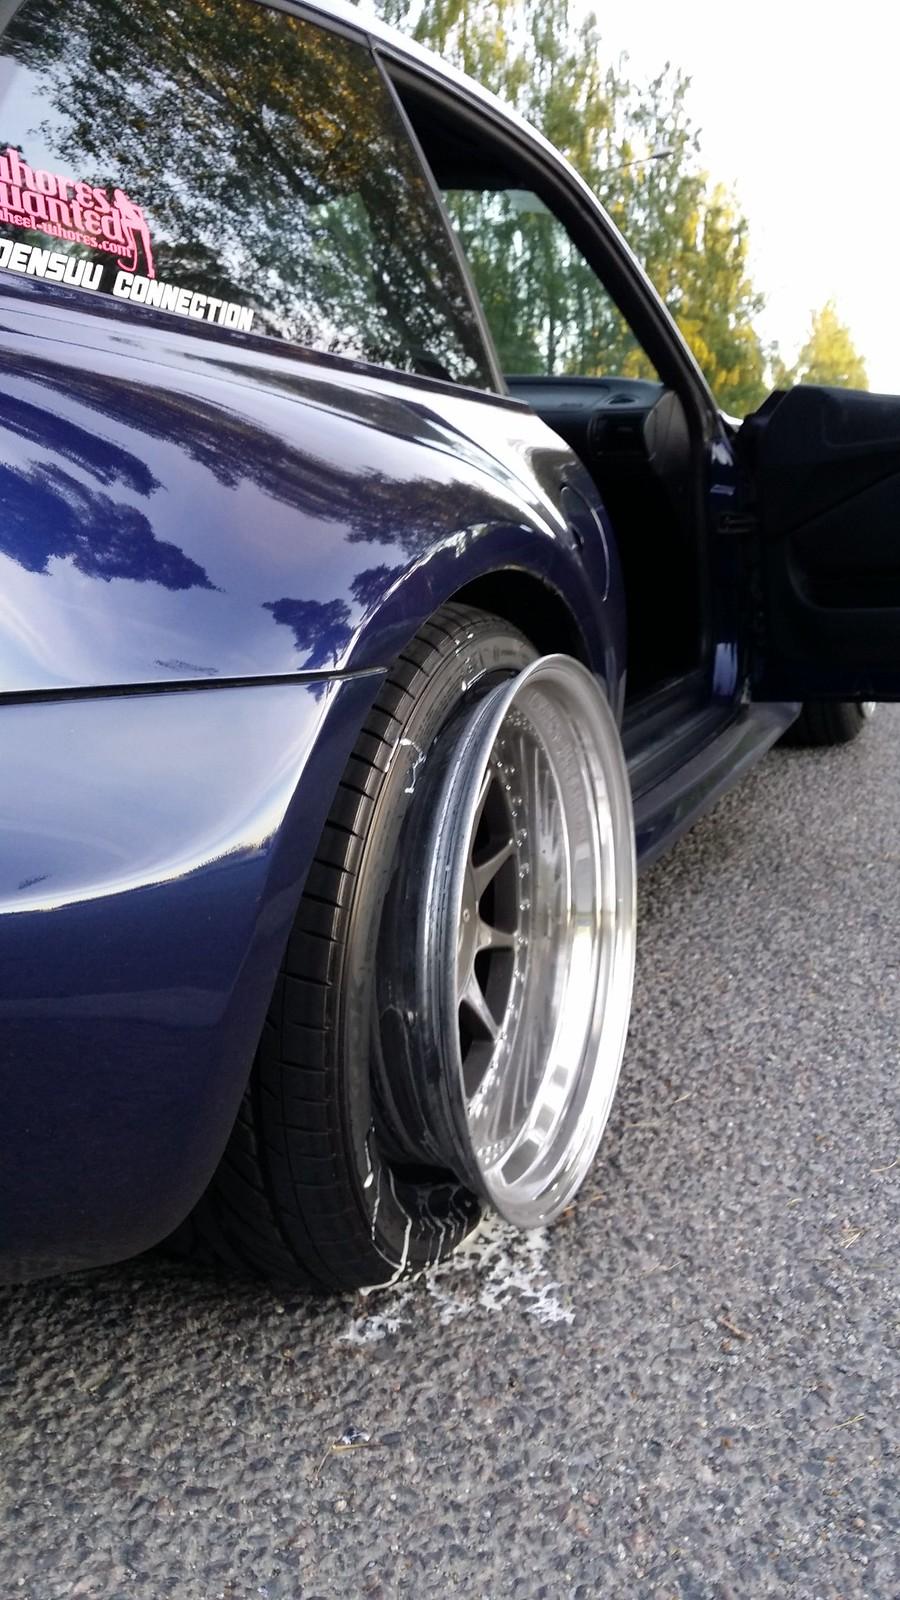 masu: Bmw z3 coupe - Sivu 3 14434150391_12bf7f2959_h